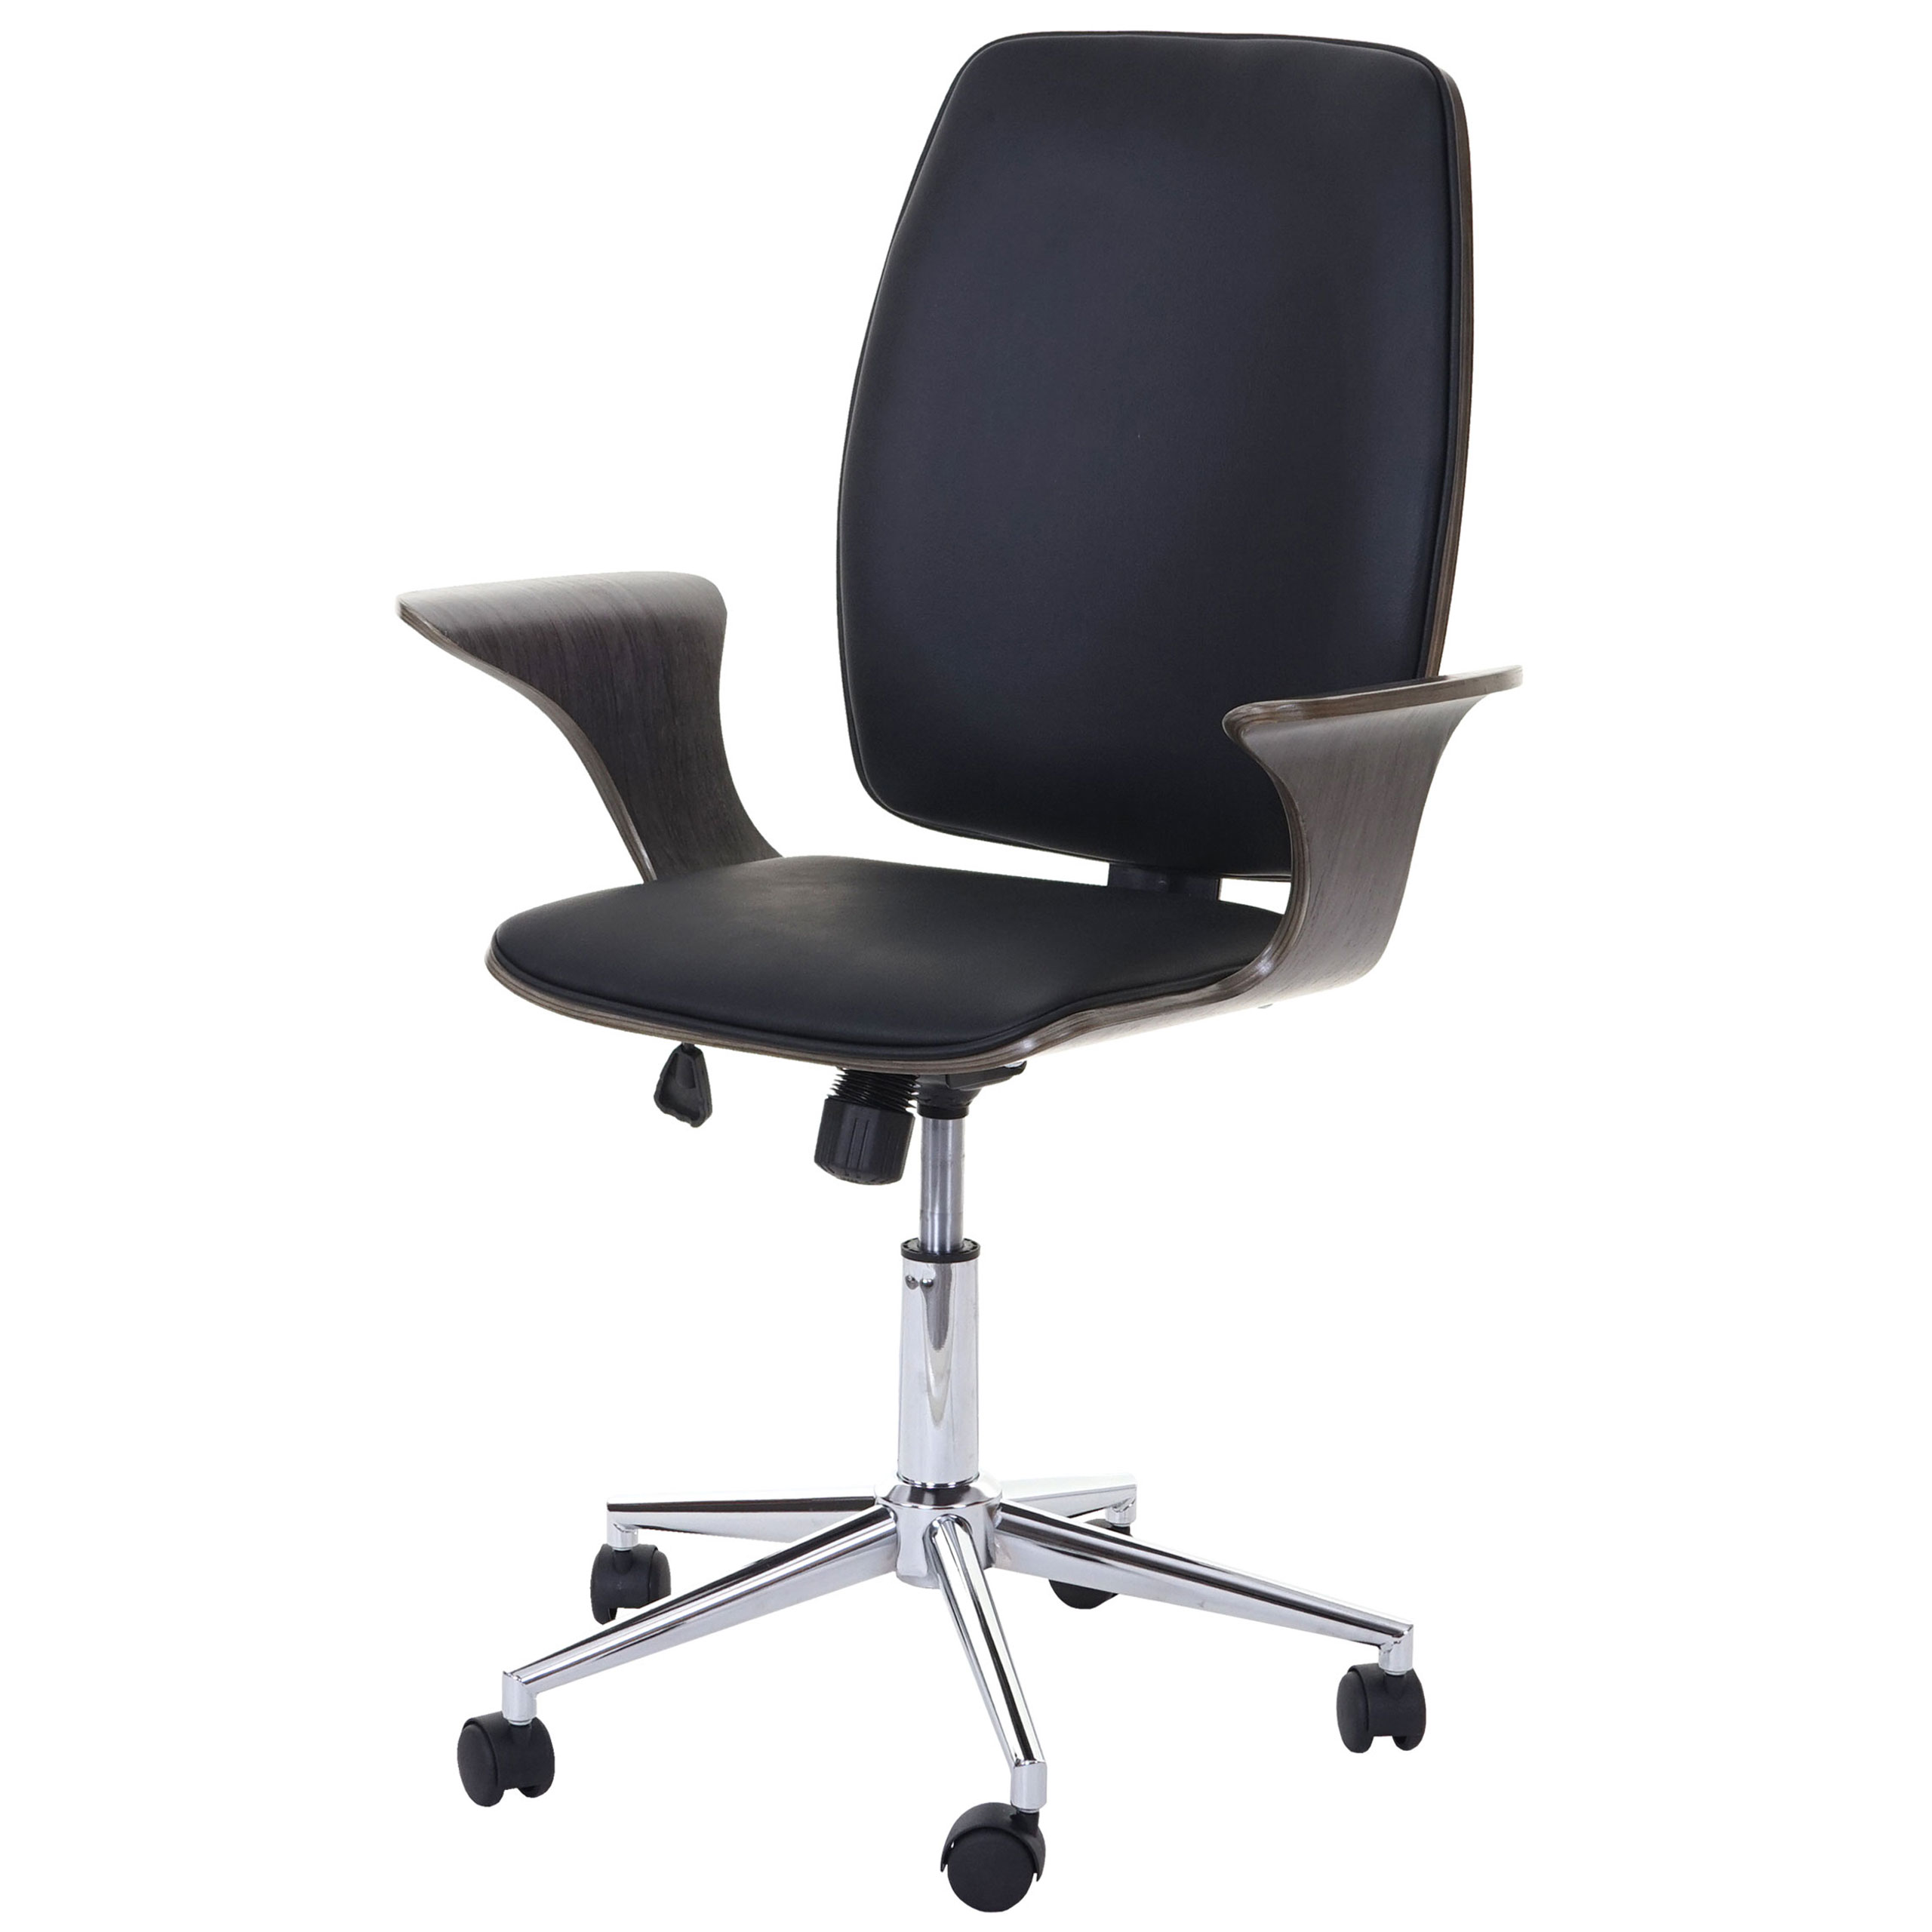 Bürostuhl HWC-C54 Vorderansicht